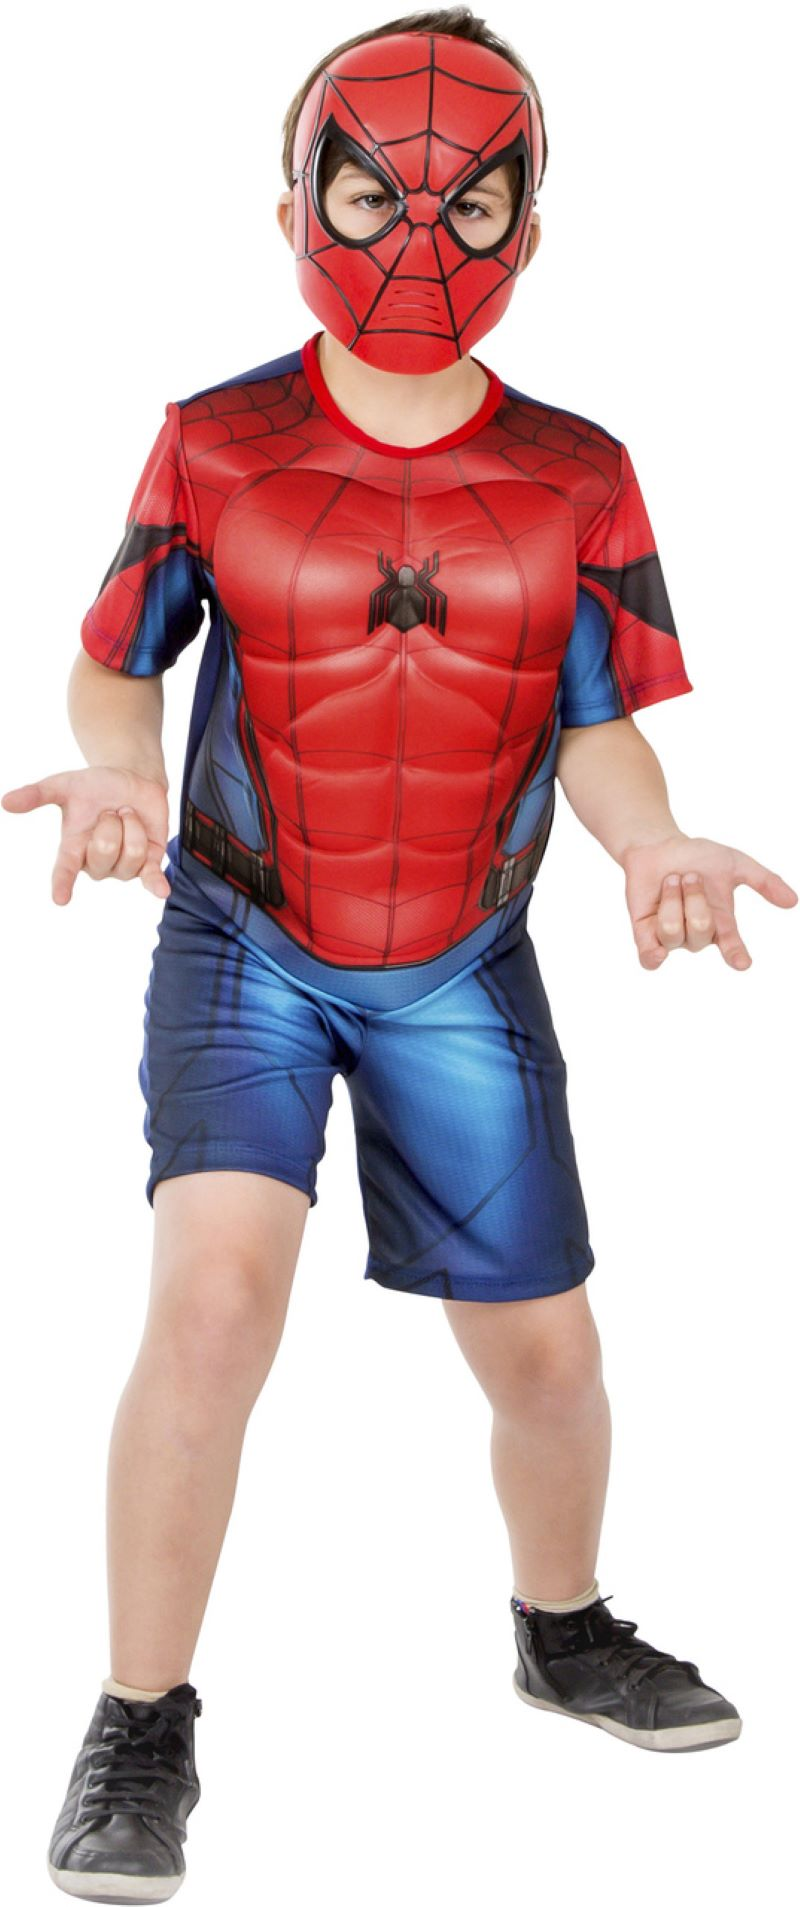 Fantasia Homem Aranha Curta Com Músculos Spiderman Infantil